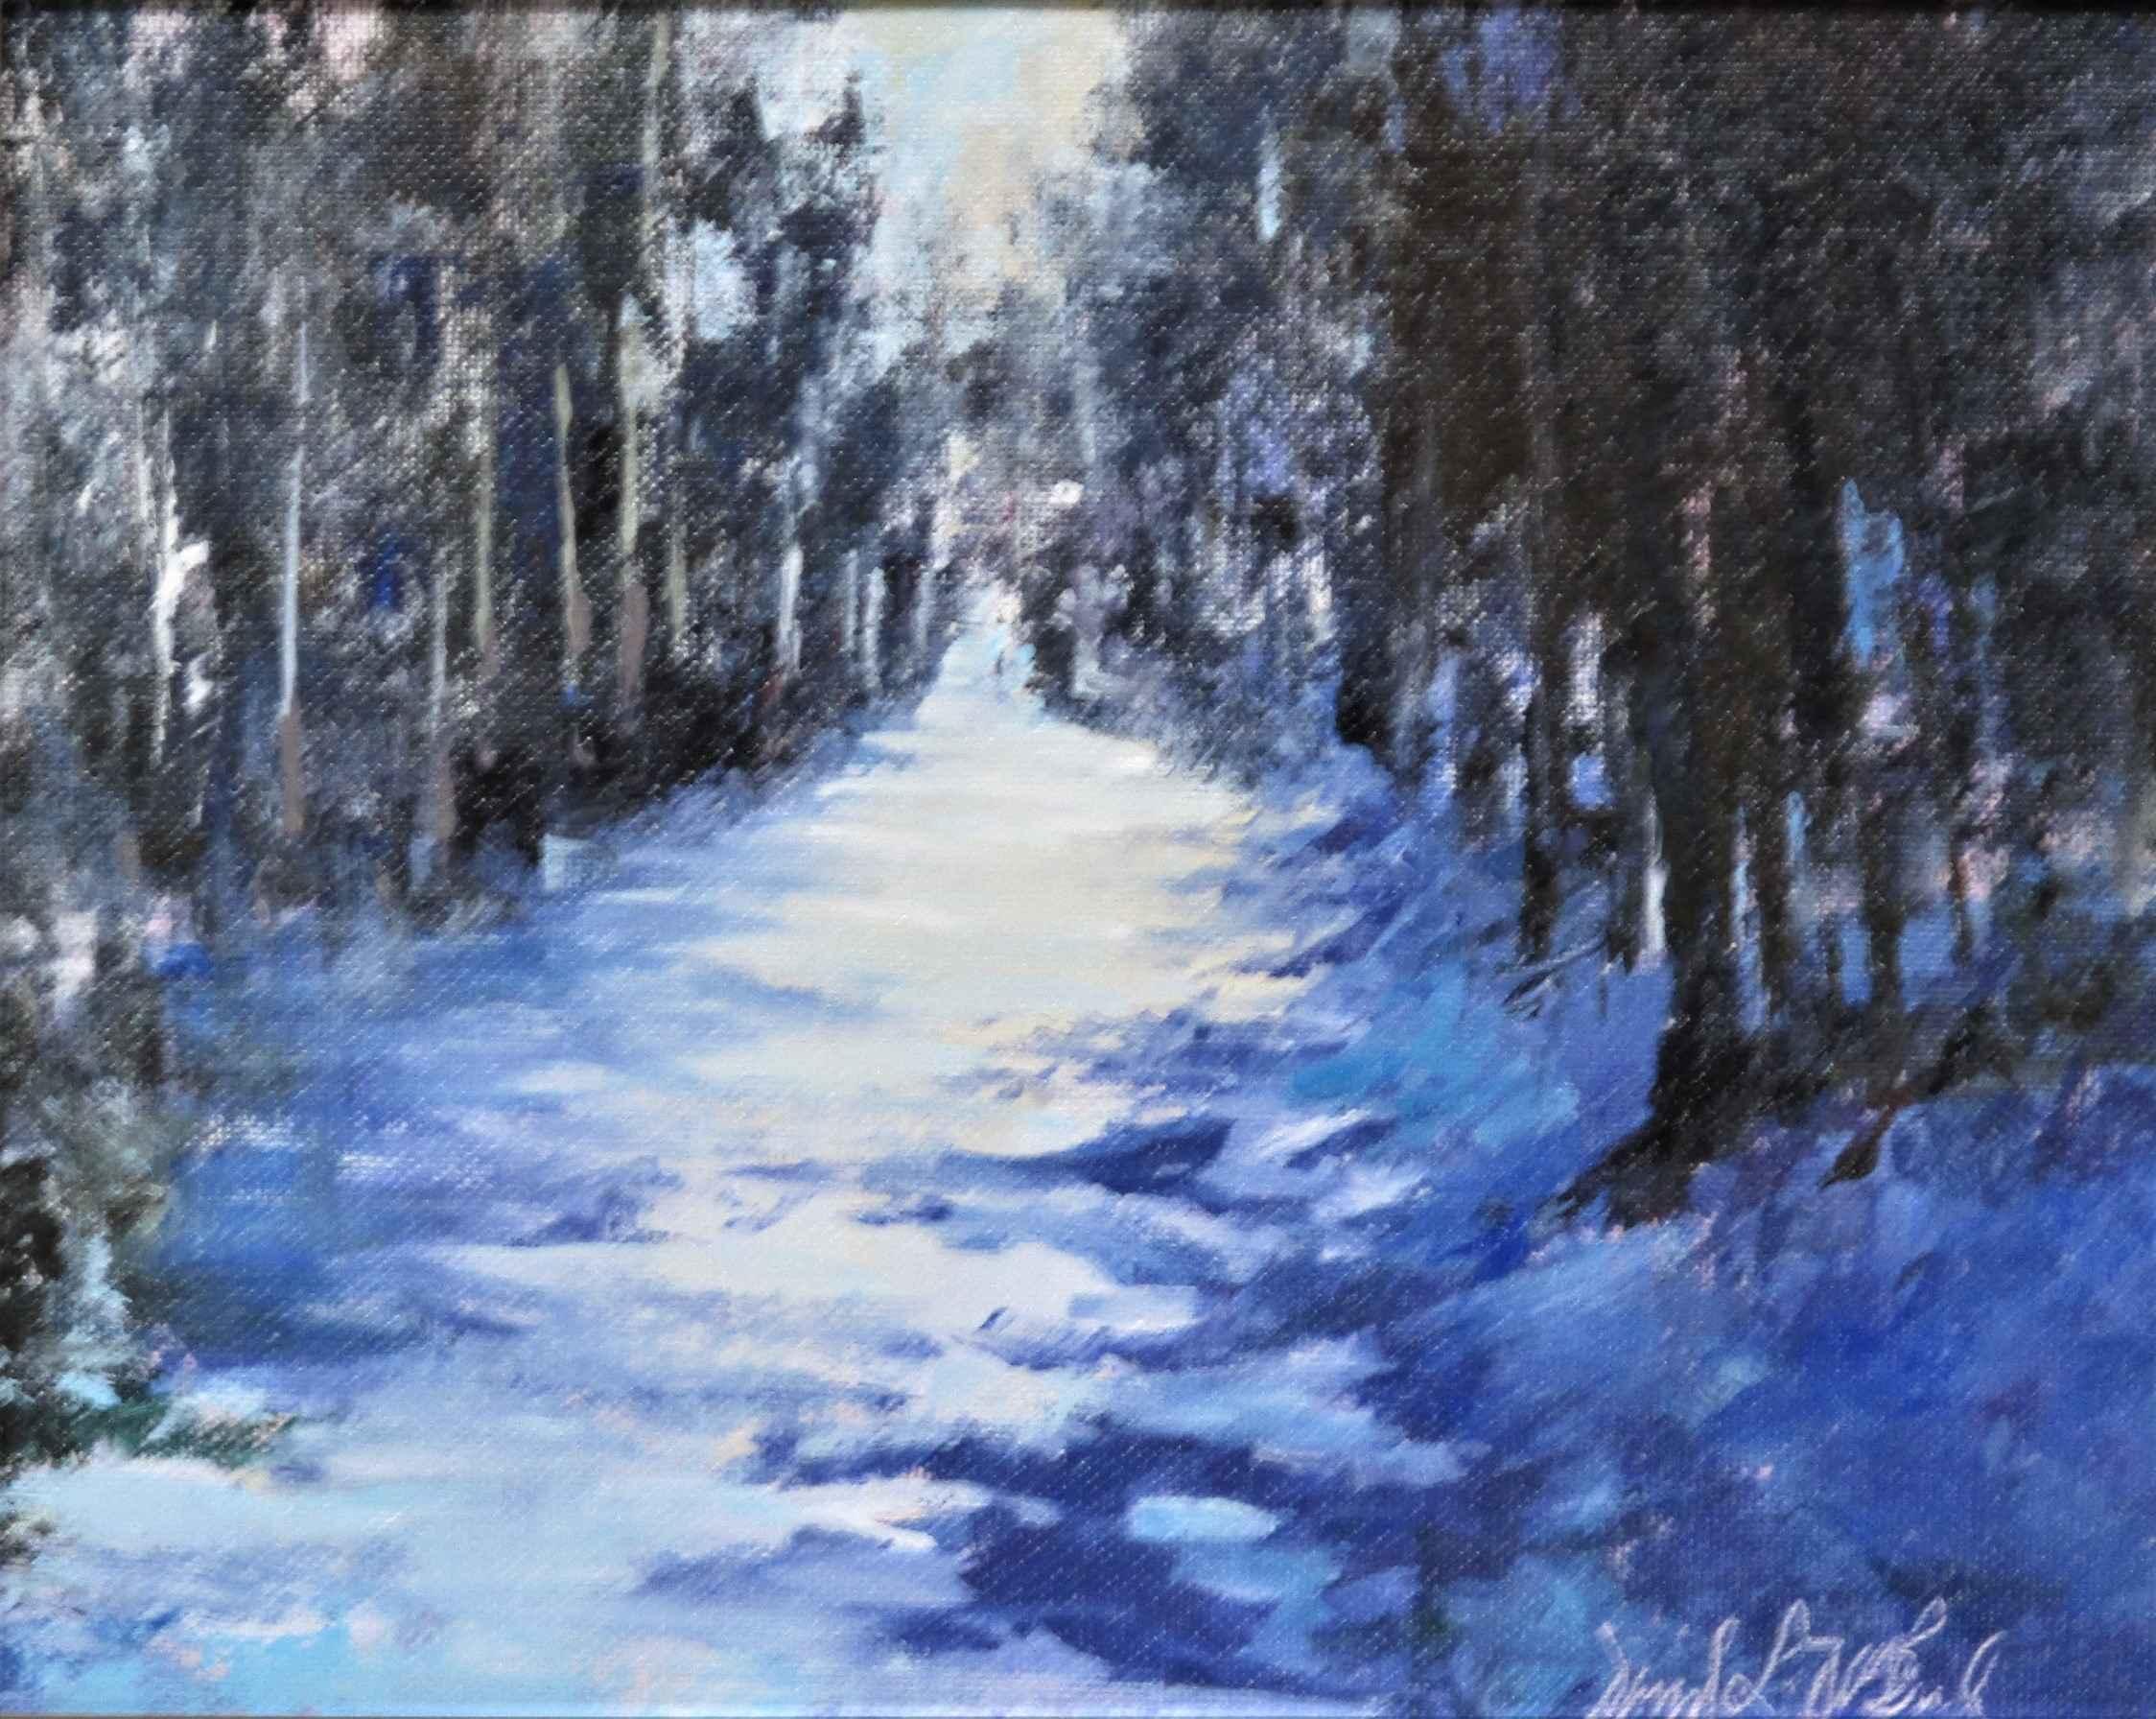 Walk in the Woods by  David McBride - Masterpiece Online